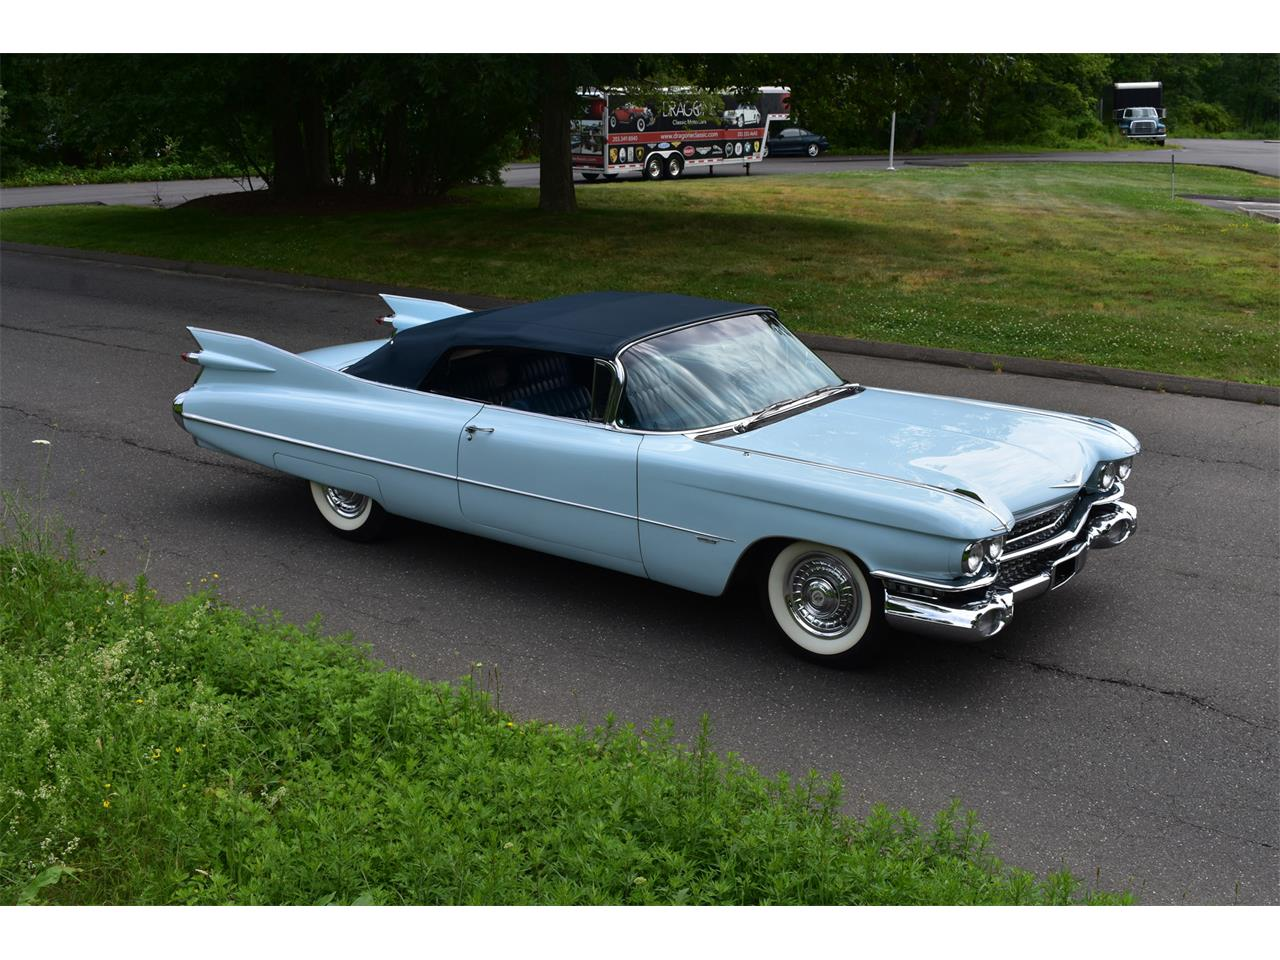 1959 Cadillac Series 62 (CC-1216955) for sale in Orange, Connecticut